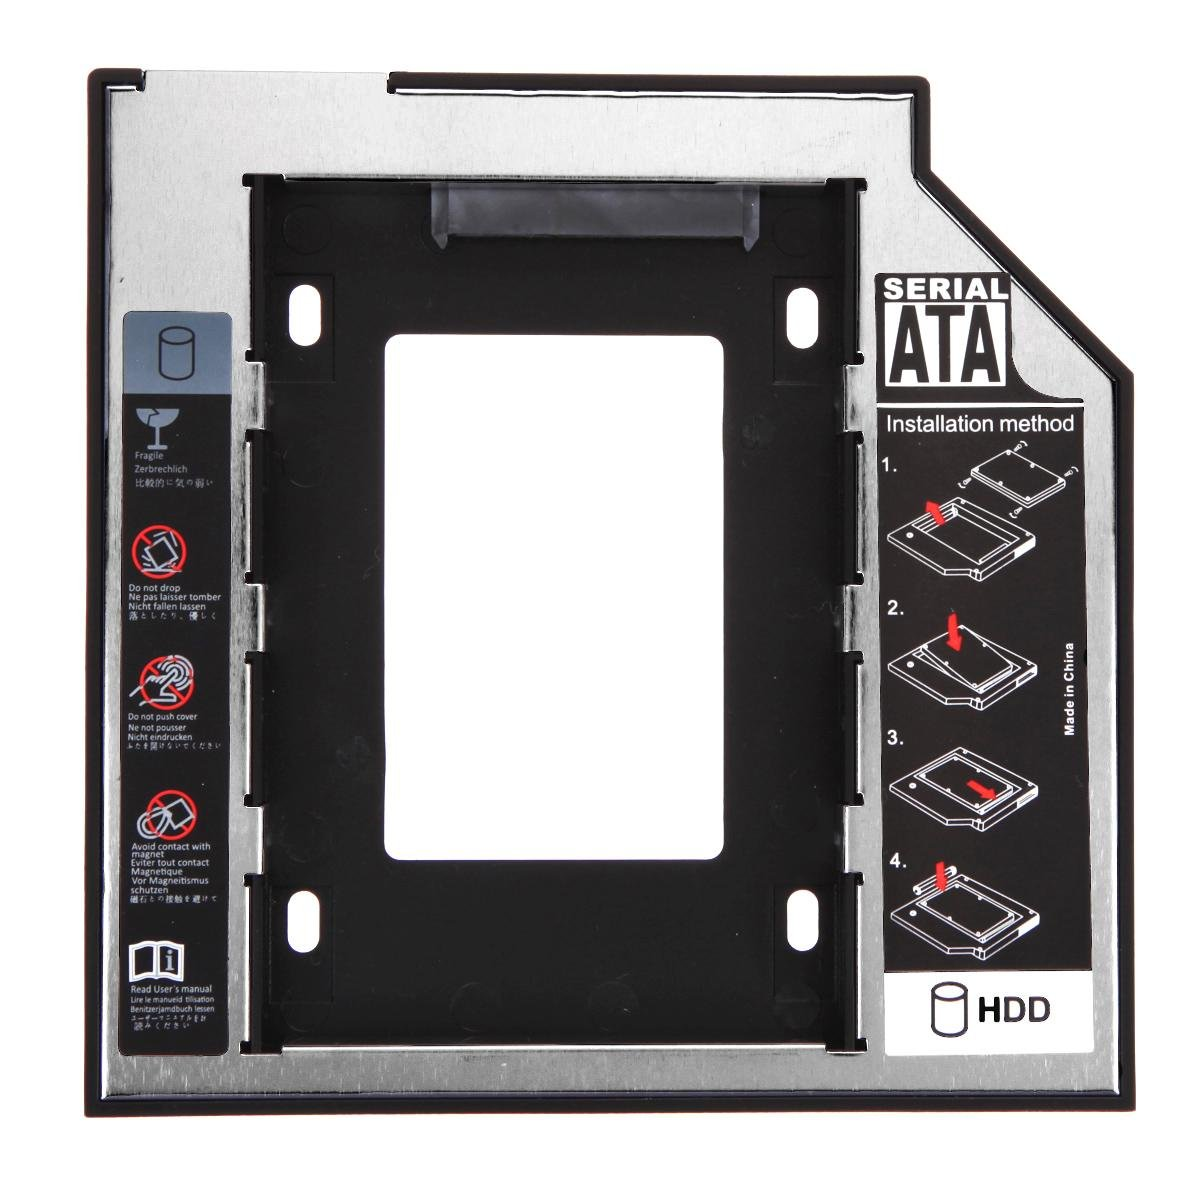 Everpert - Adaptador de Disco Duro SSD SATA DE 9, 5 mm para Disco Duro DE 2, 5 Pulgadas